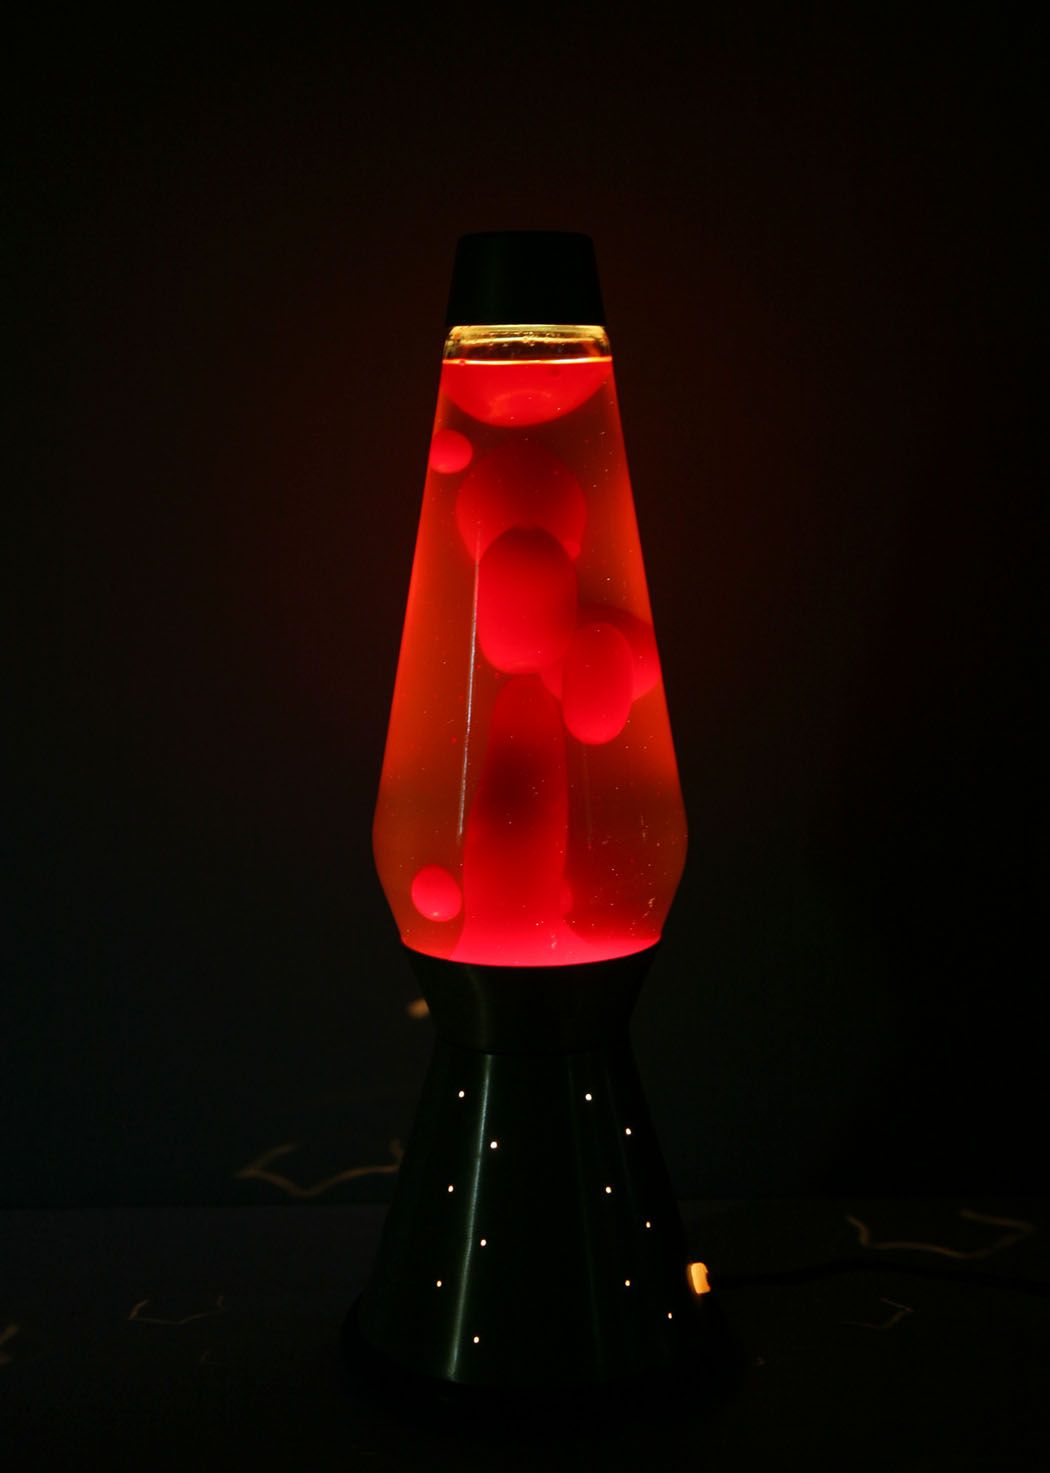 red lava lamp lava lamps in 2019 cool lava lamps lava lamp lava. Black Bedroom Furniture Sets. Home Design Ideas